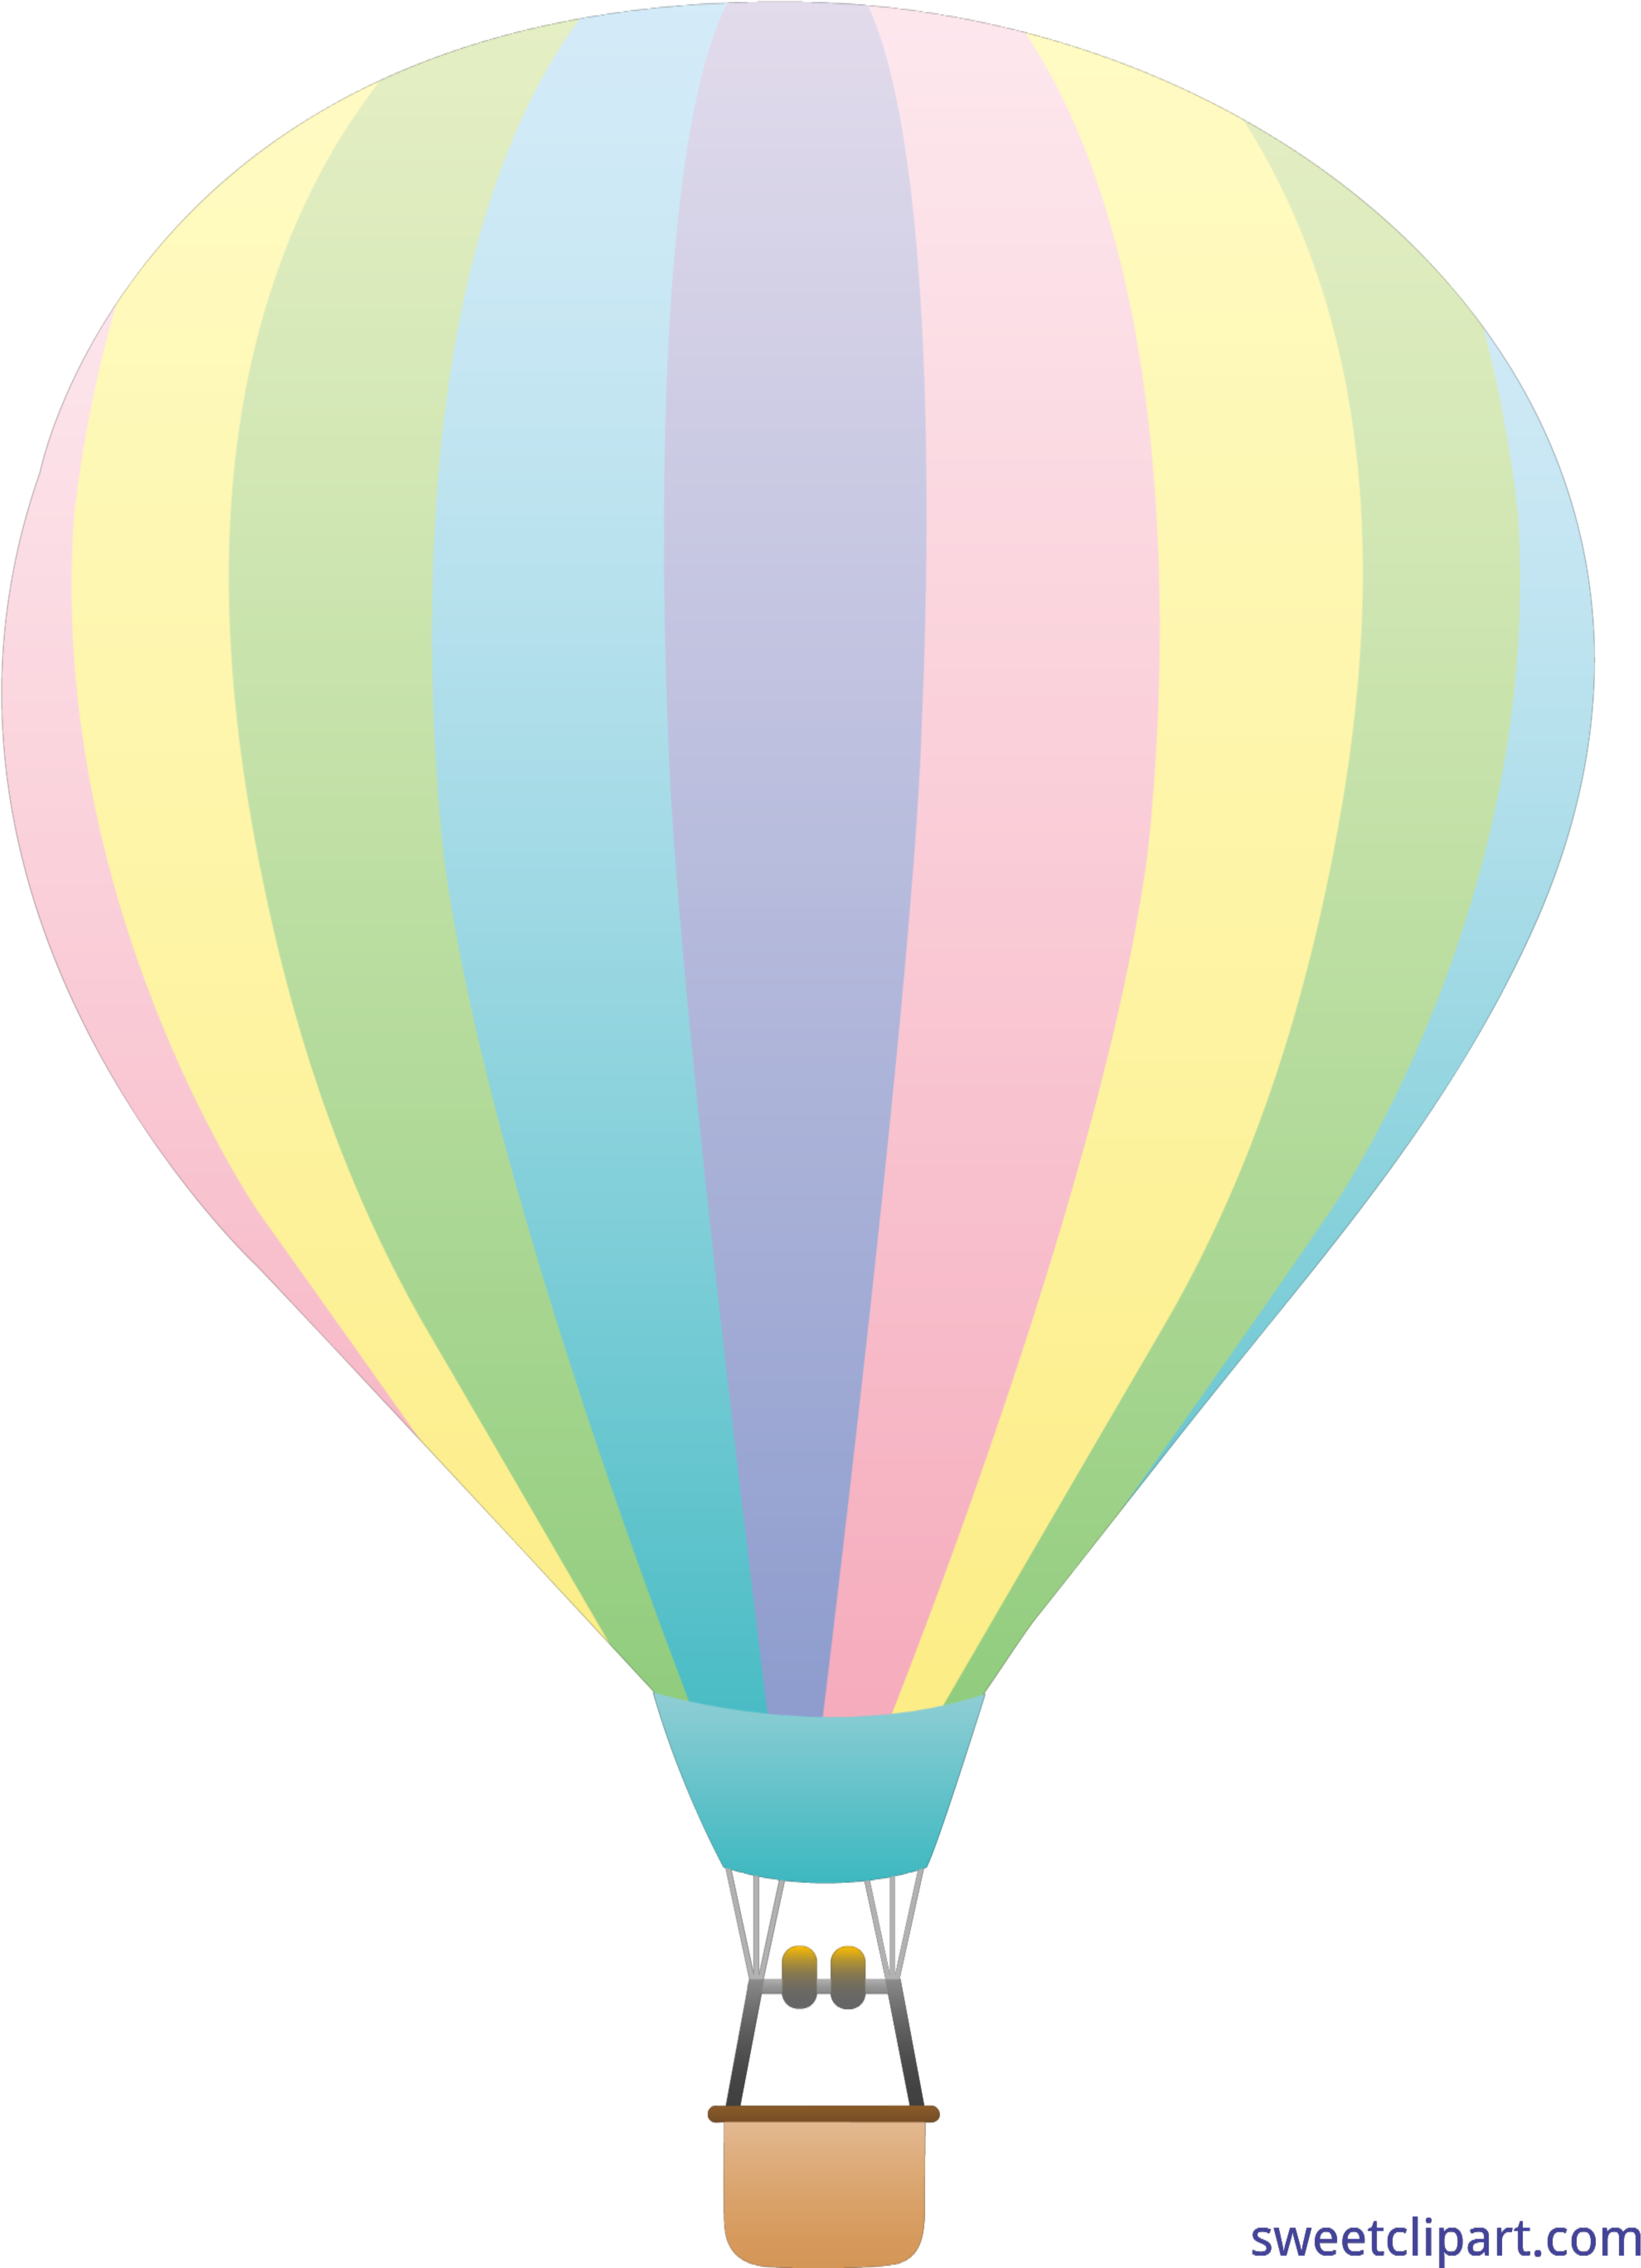 Aesthetic hot air balloon clipart vector library download Vector Transparent Download Hot Air Clip Art - Pastel Hot Air ... vector library download